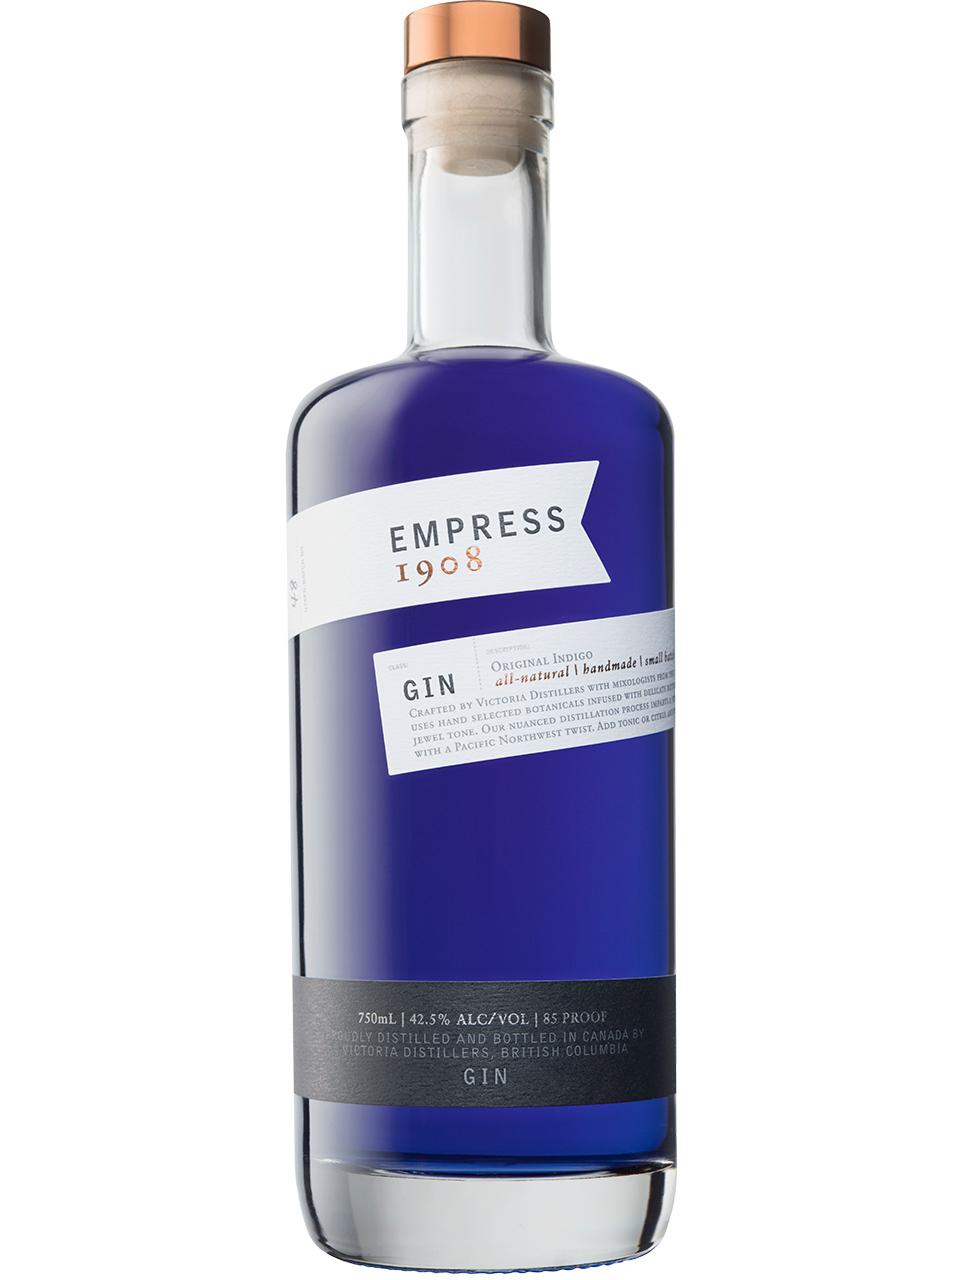 Empress 1908 Gin